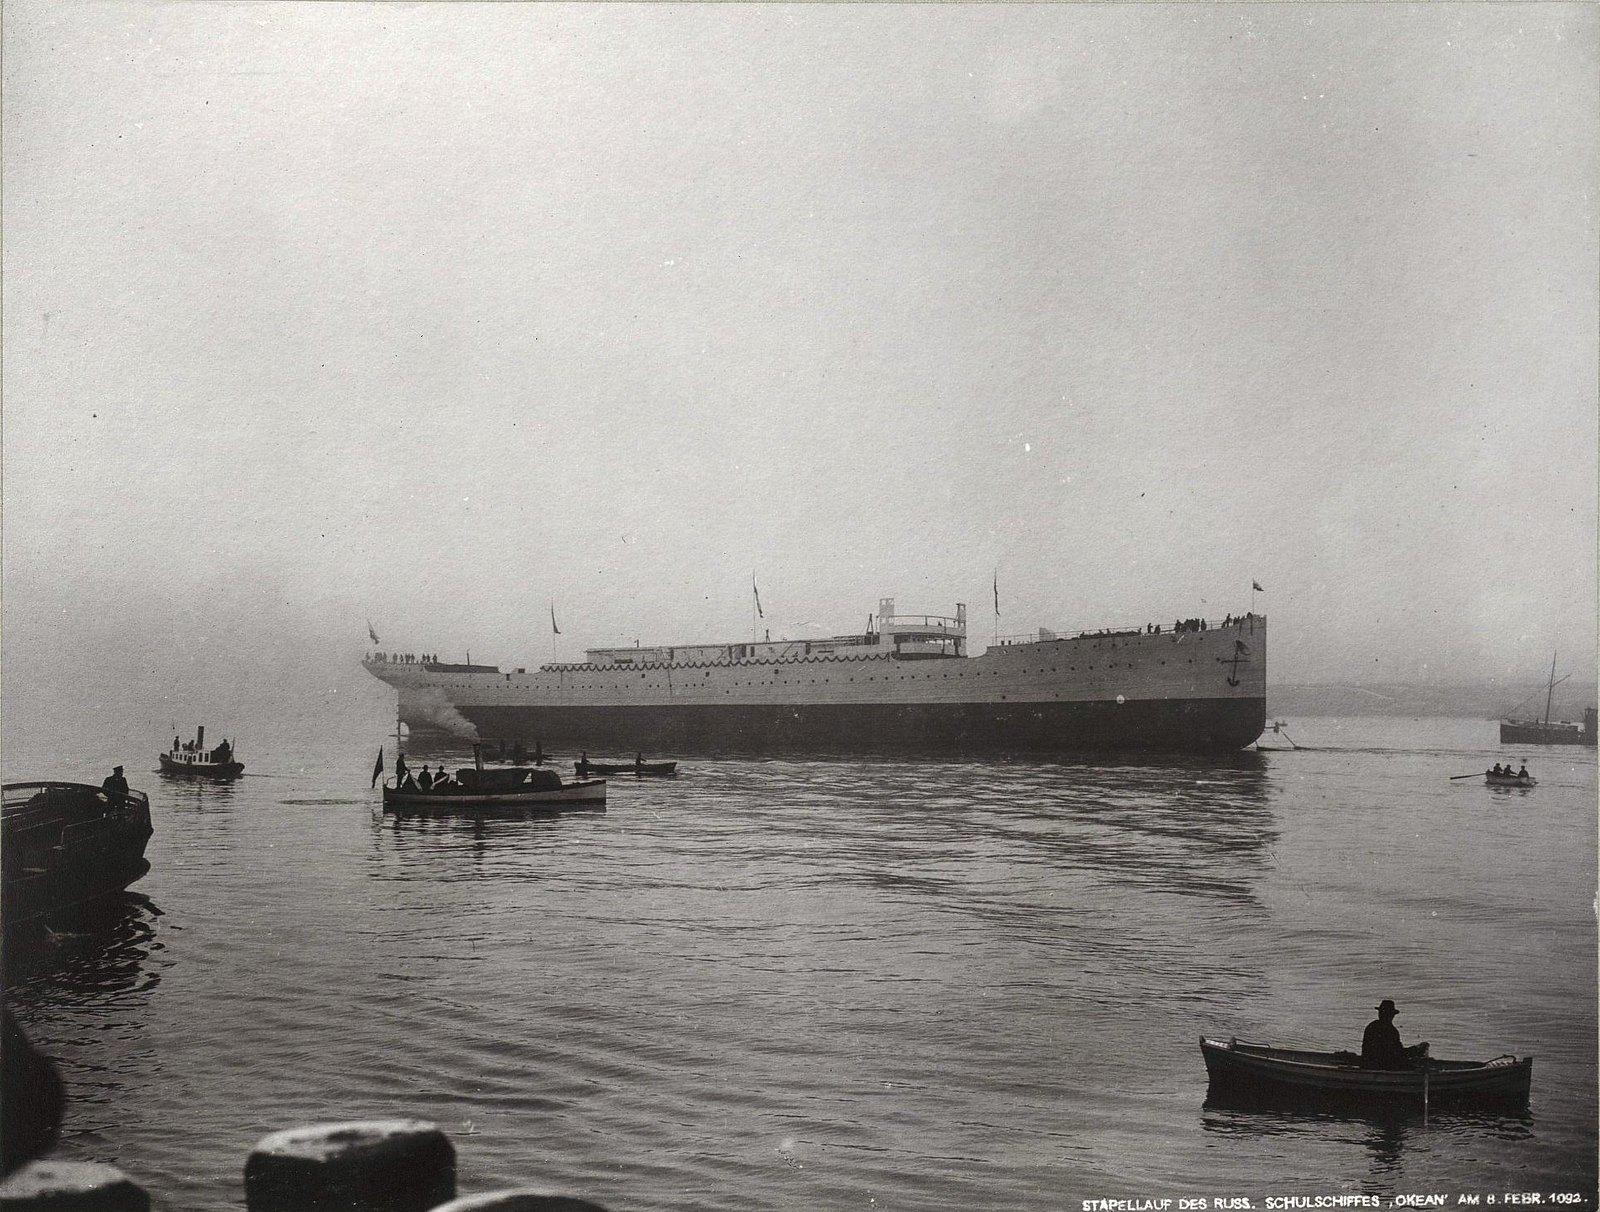 35. Учебное судно «Океан» на воде. 8 февраля 1902 г.